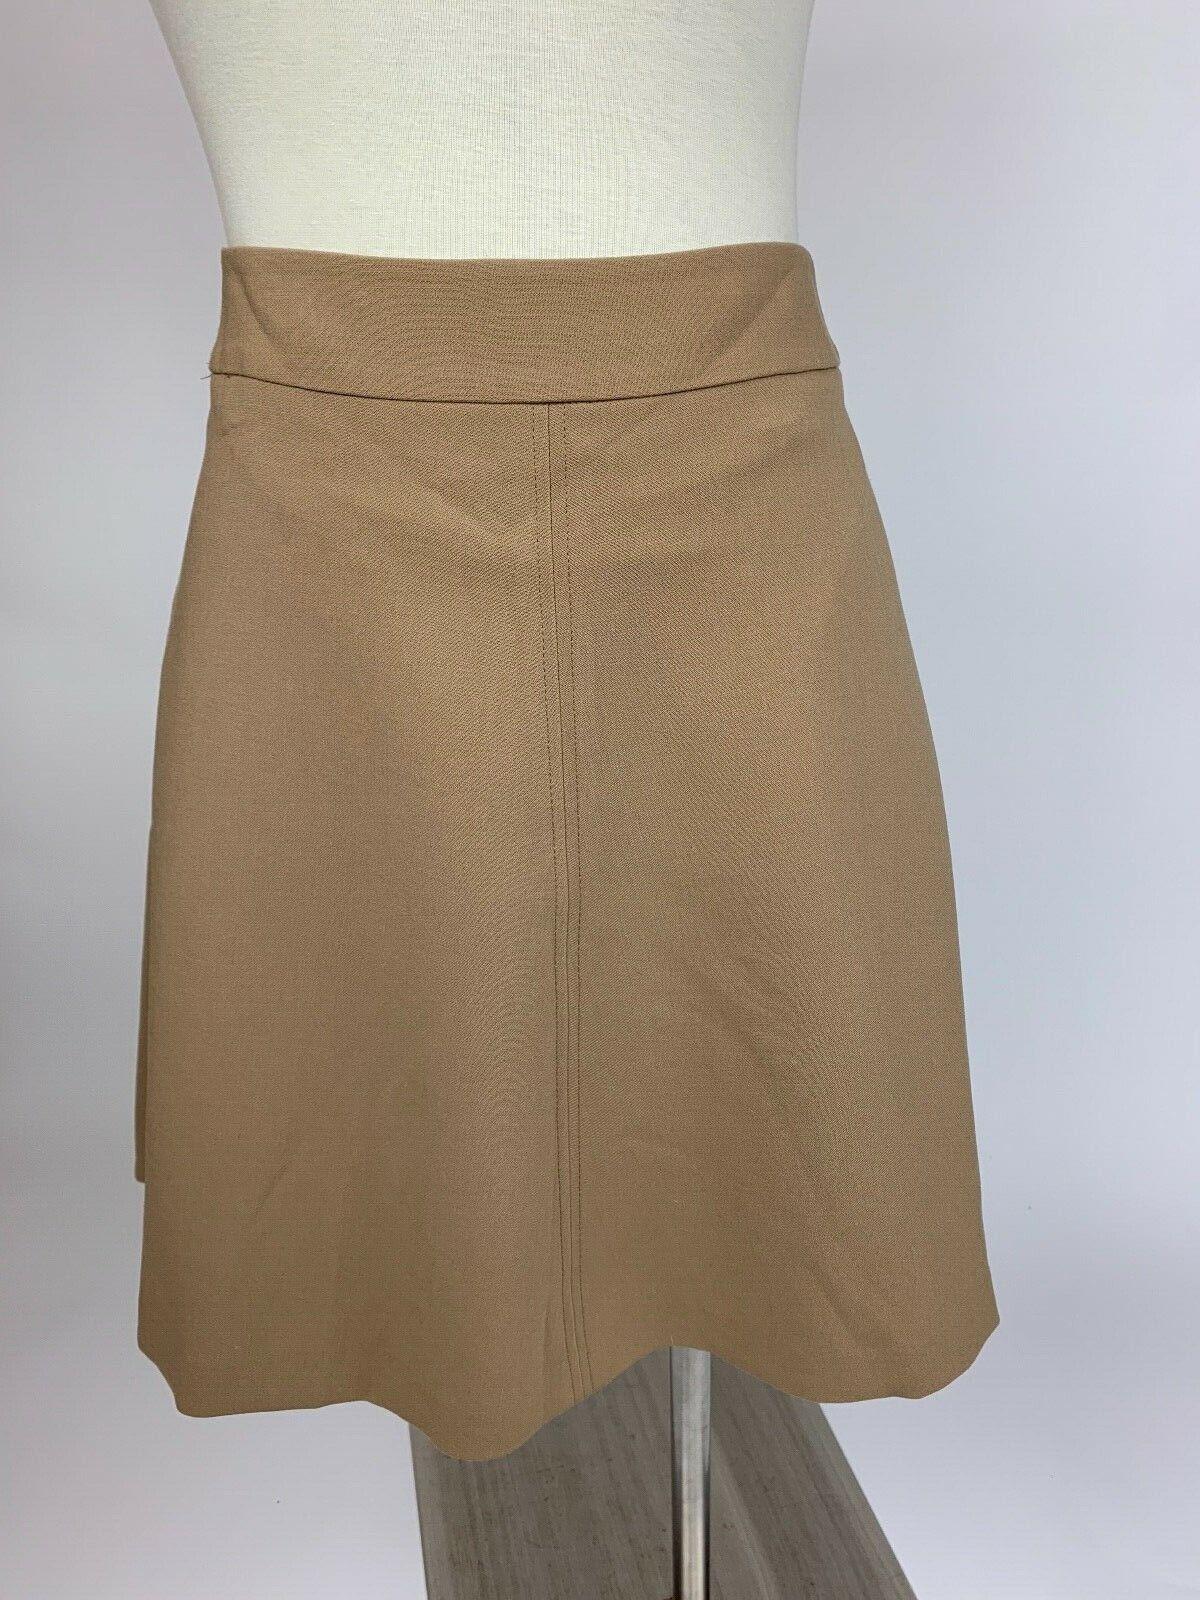 Ann Taylor Loft Camel Tan Aline Flare Skirt 2 Excellent